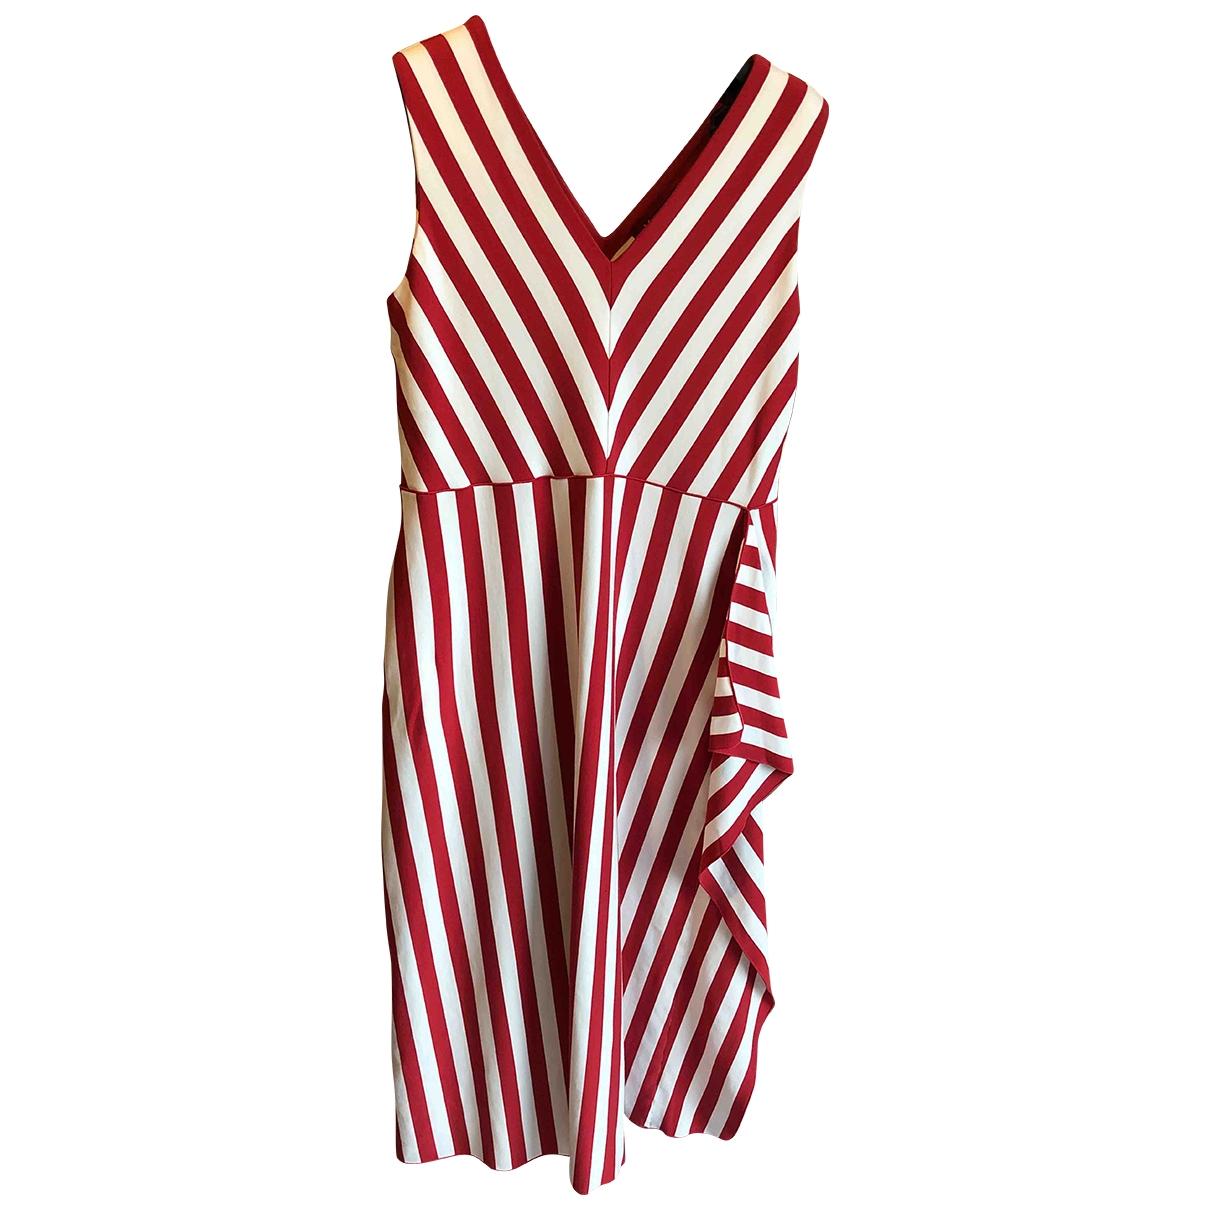 Max Mara Studio \N Red dress for Women L International